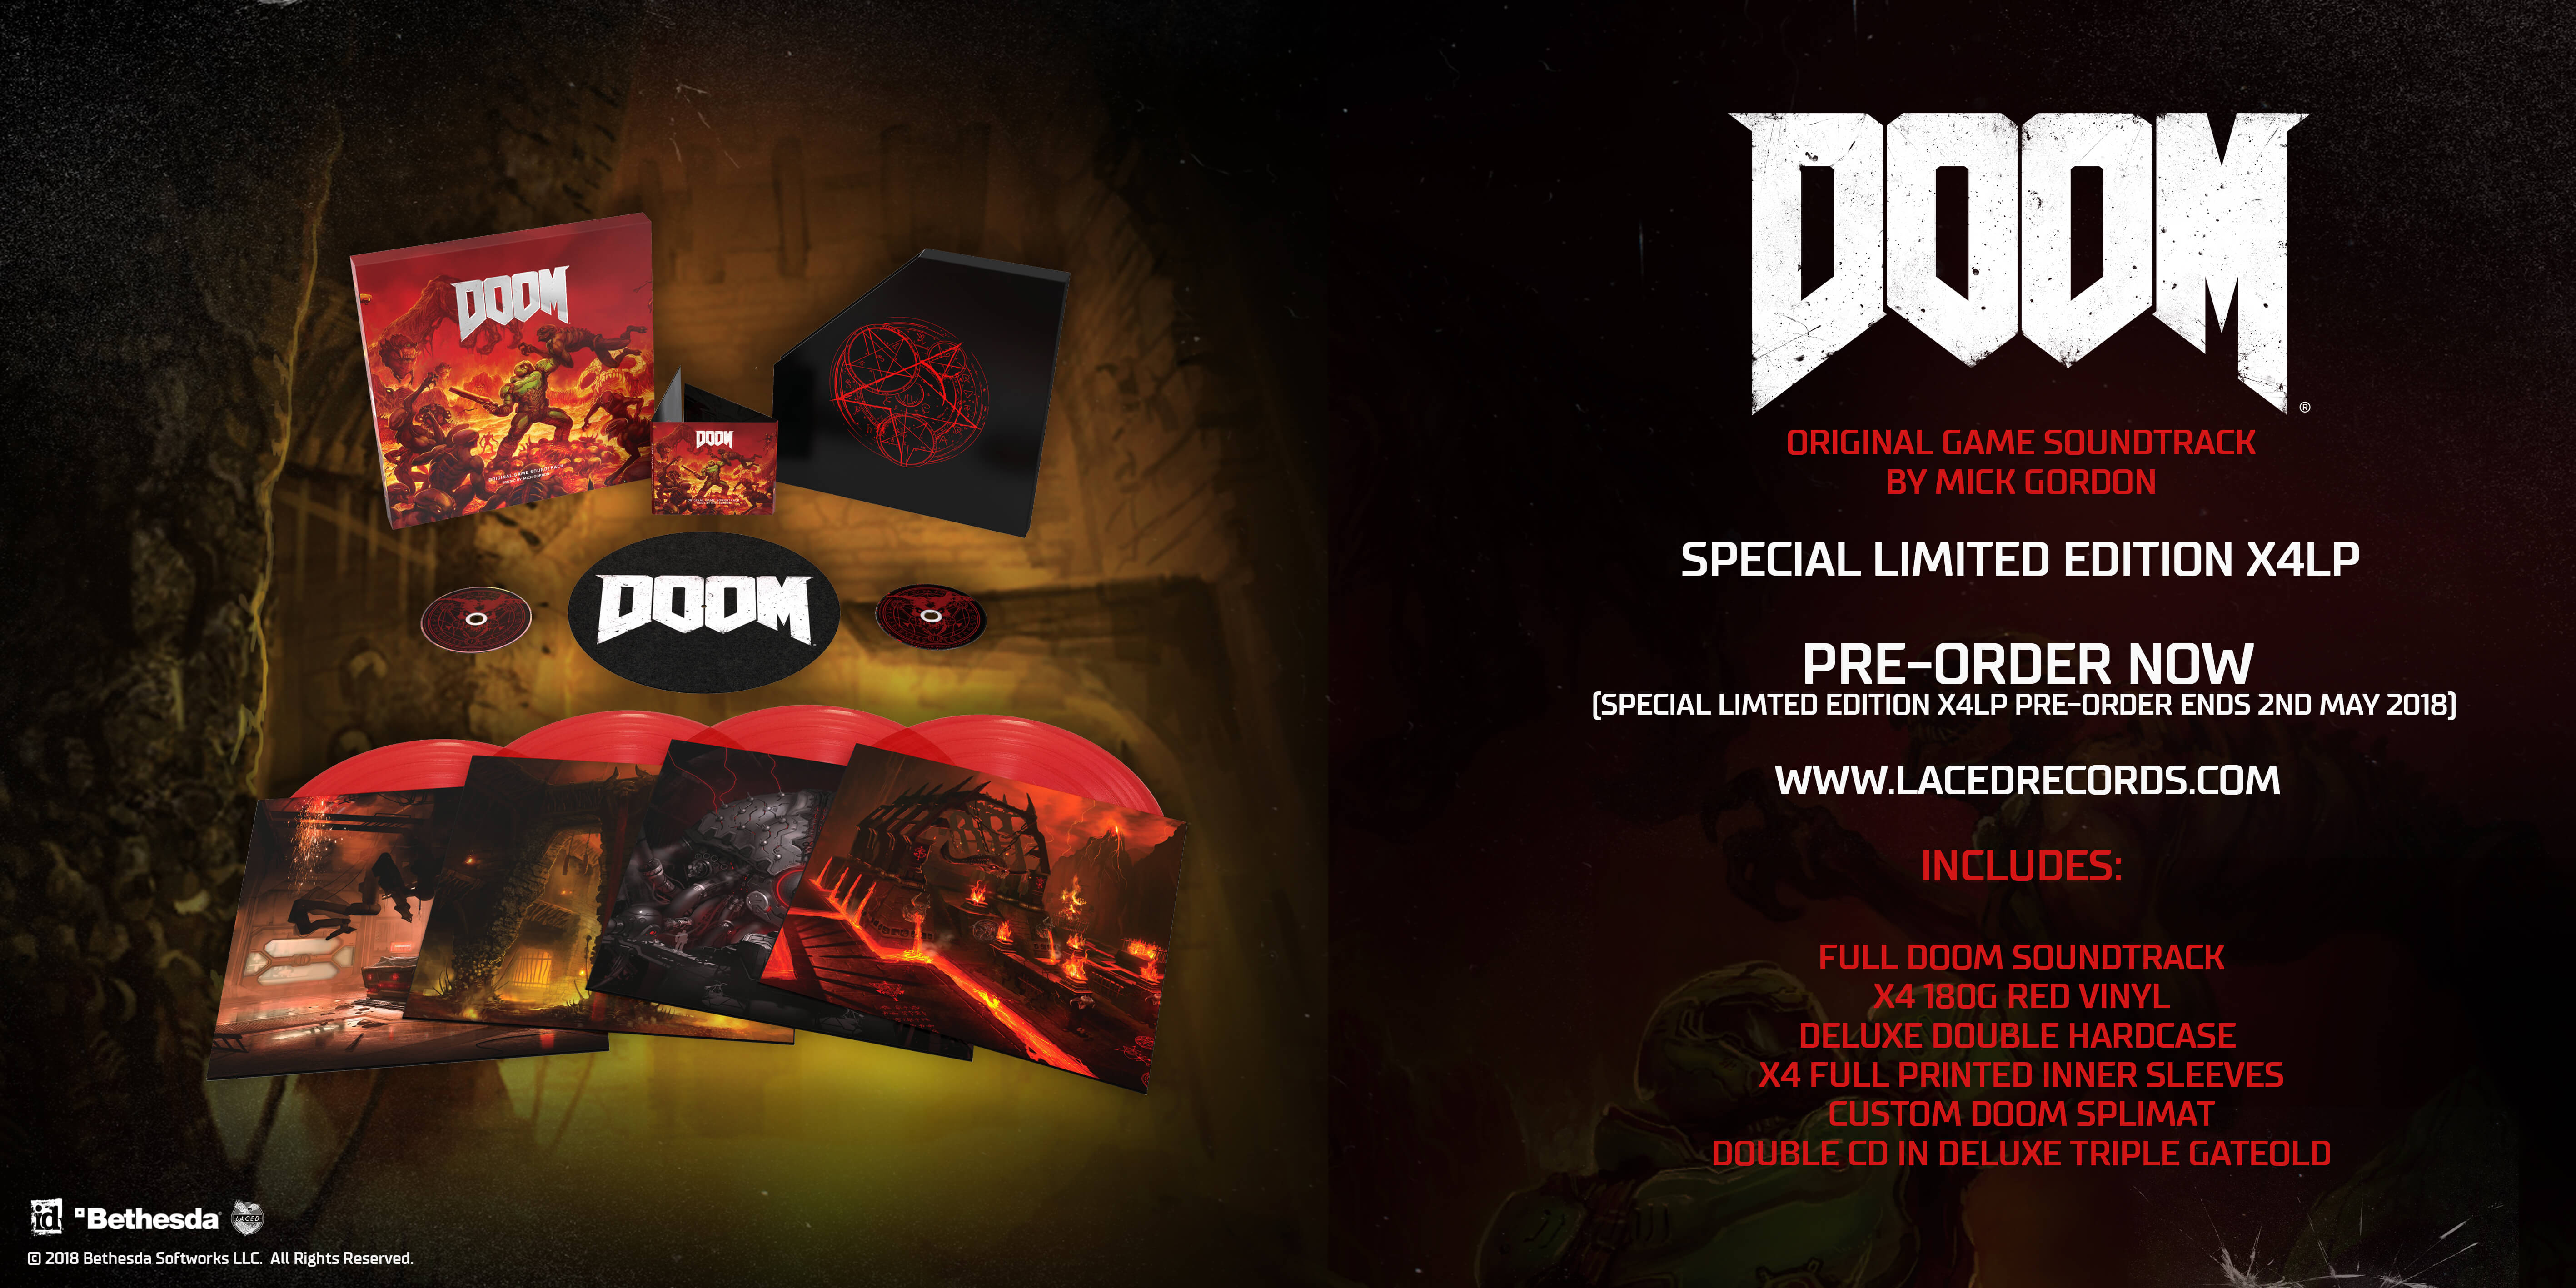 DOOM® (Original Game Soundtrack) rips and tears its way onto